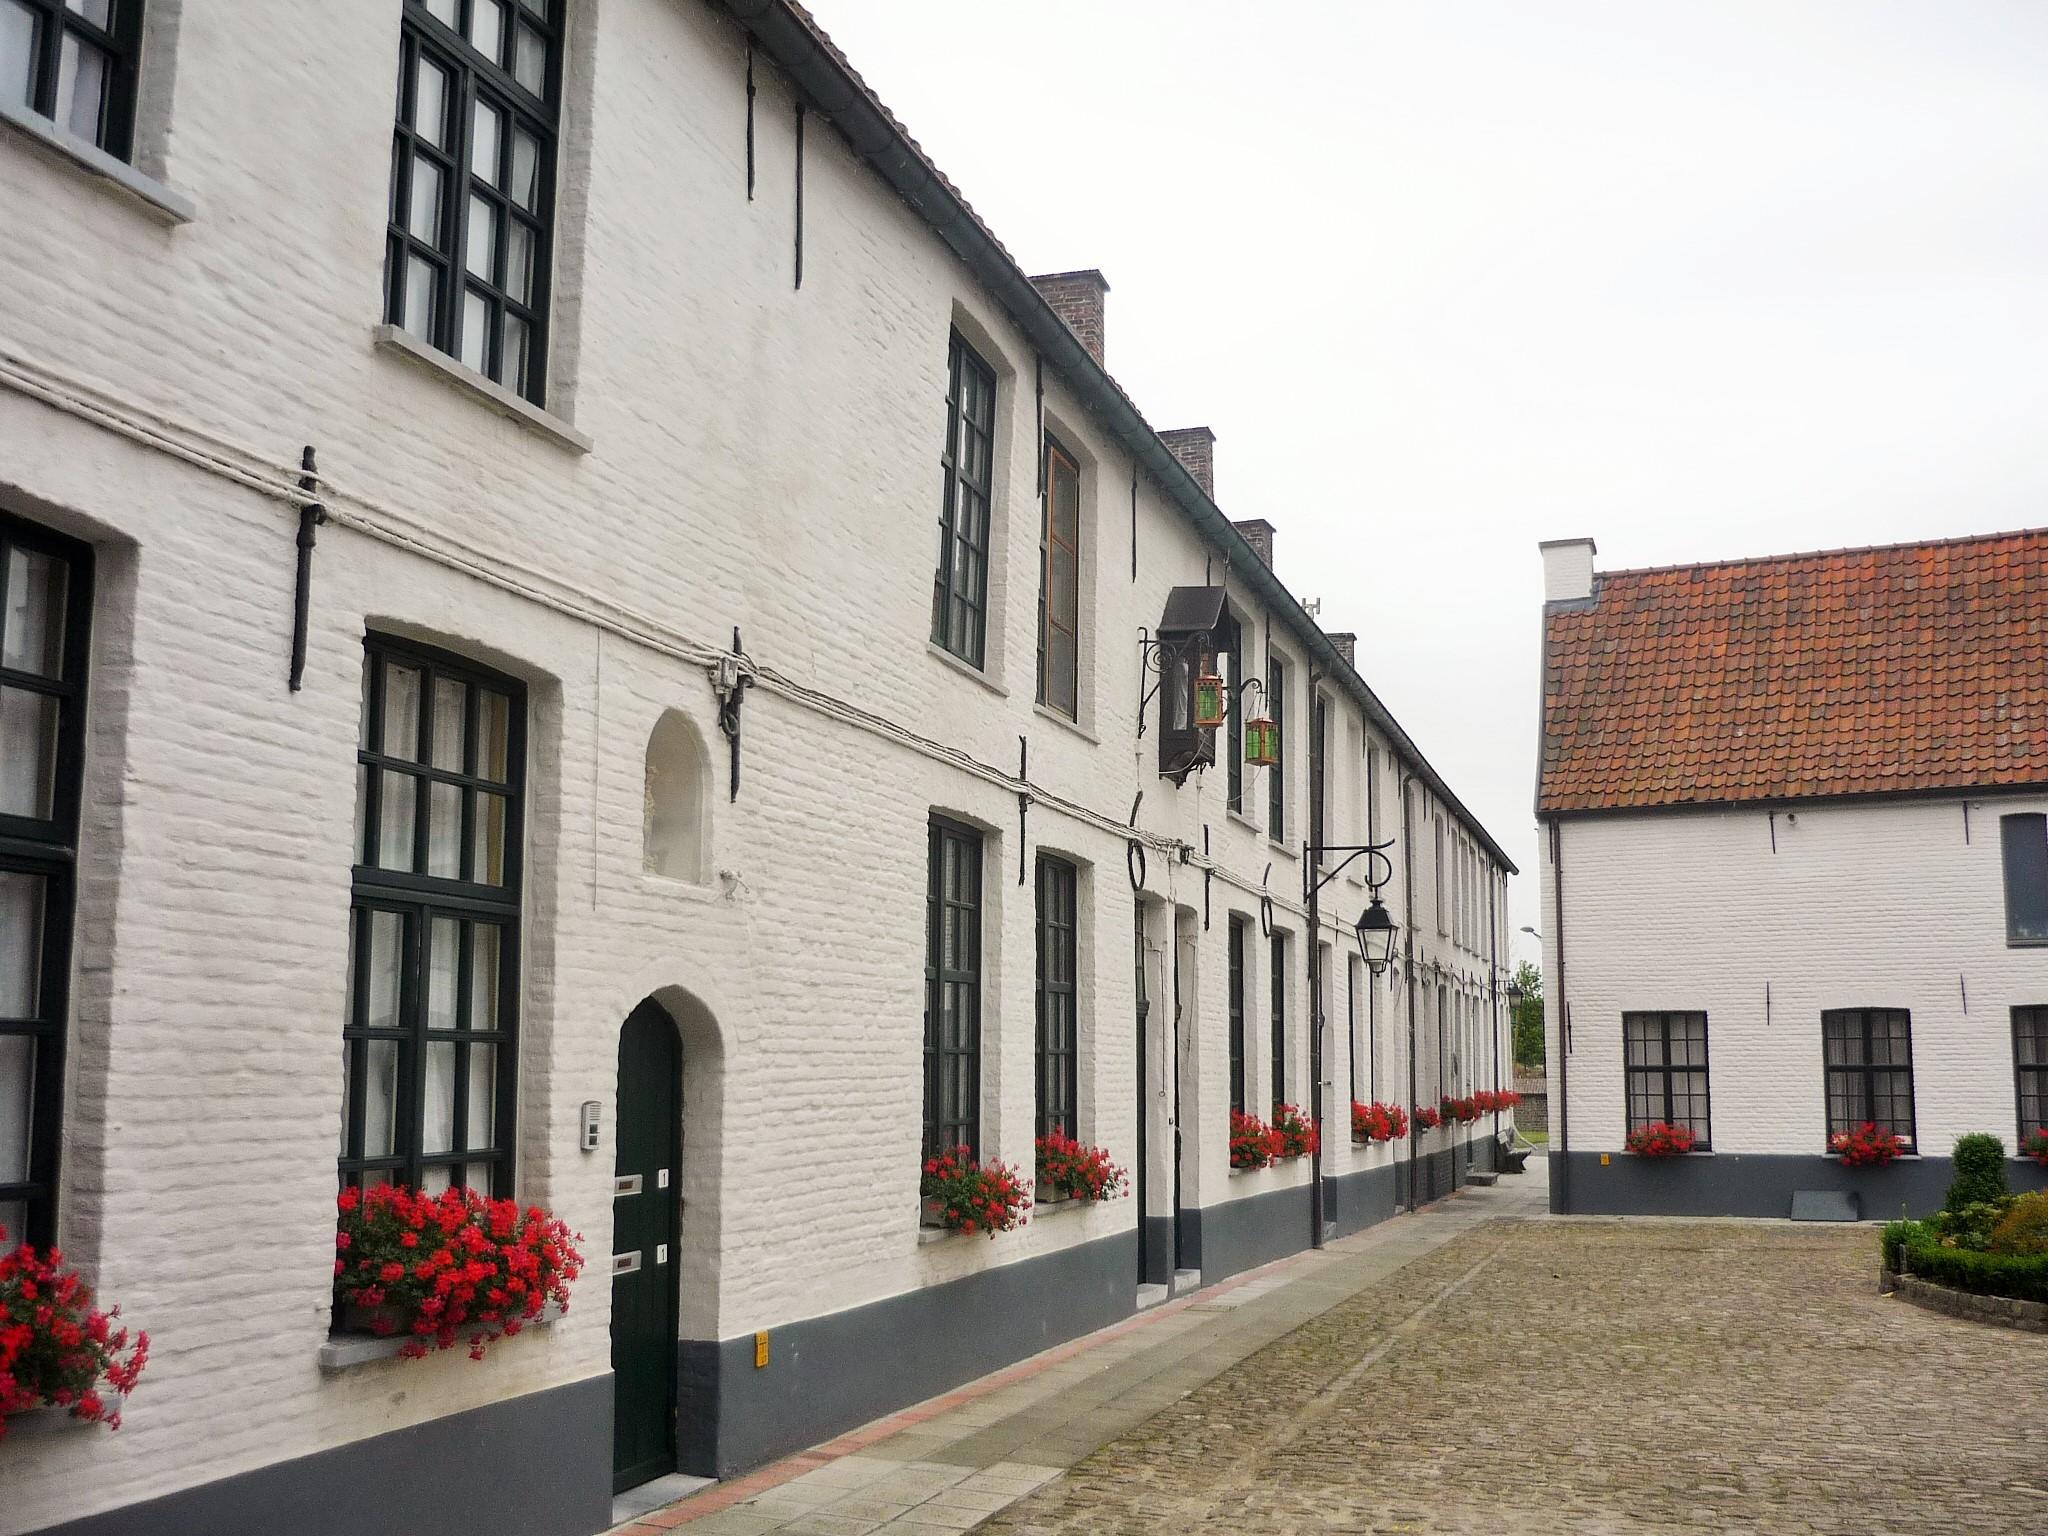 Oudenaarde - Fedezzük fel Flandriát 017.jpg